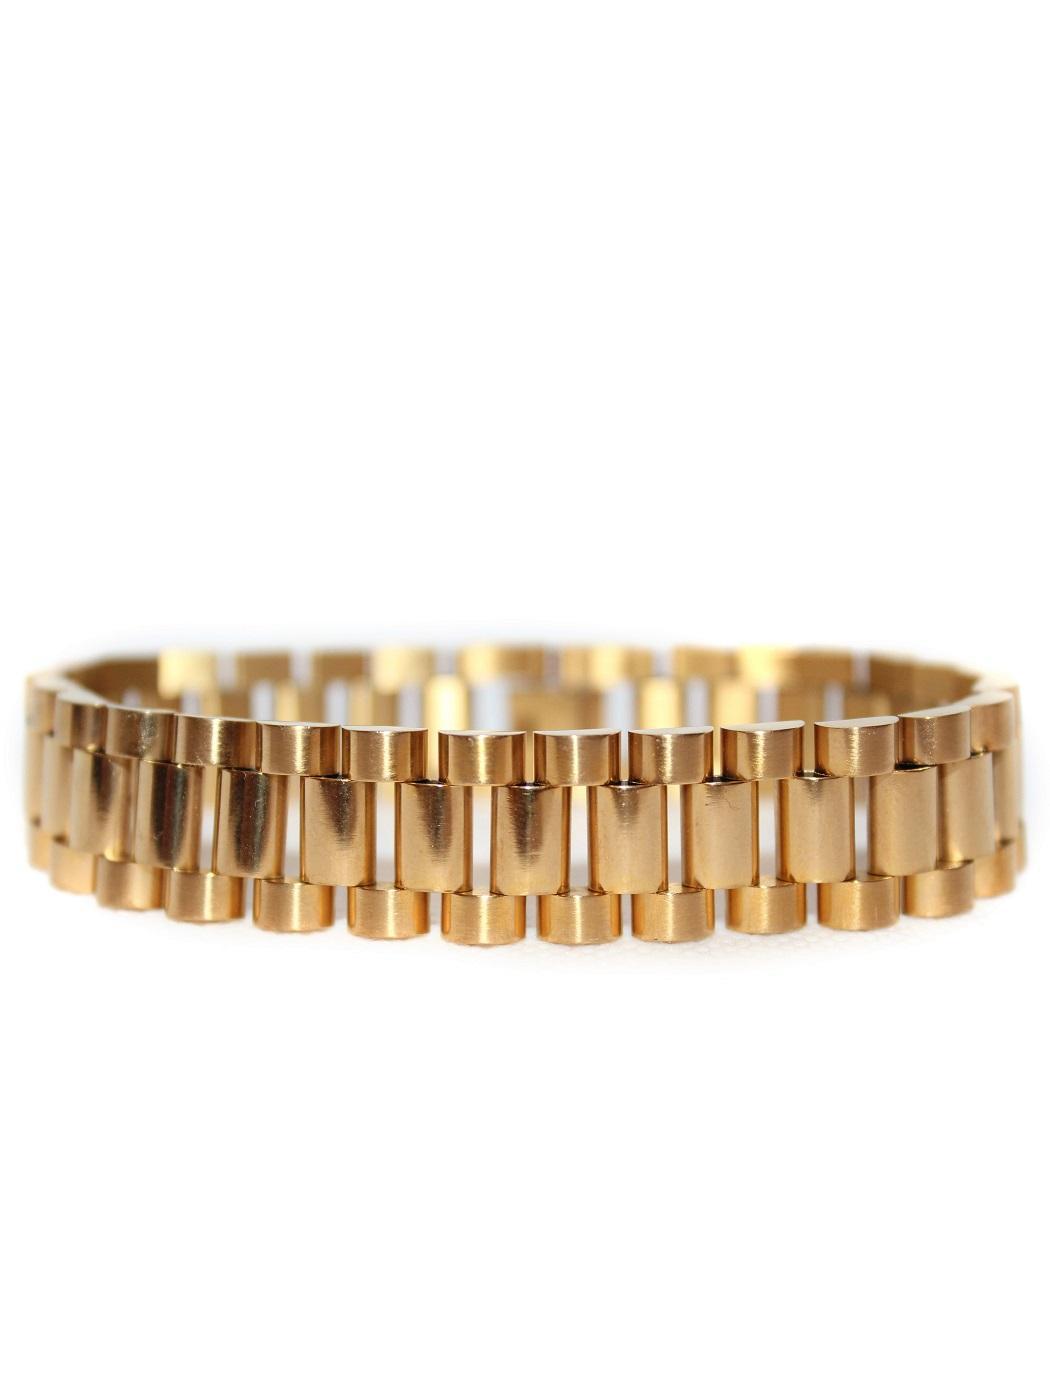 Cool Bracelets, Mens Cuff Bracelets, Jewelry Bracelets, Anchor Bracelet, Charms For Charm Bracelets, Cheap Bracelets, Bracelet Set, Mens Anchor Bracelet, Amazon Bracelet For Men New York